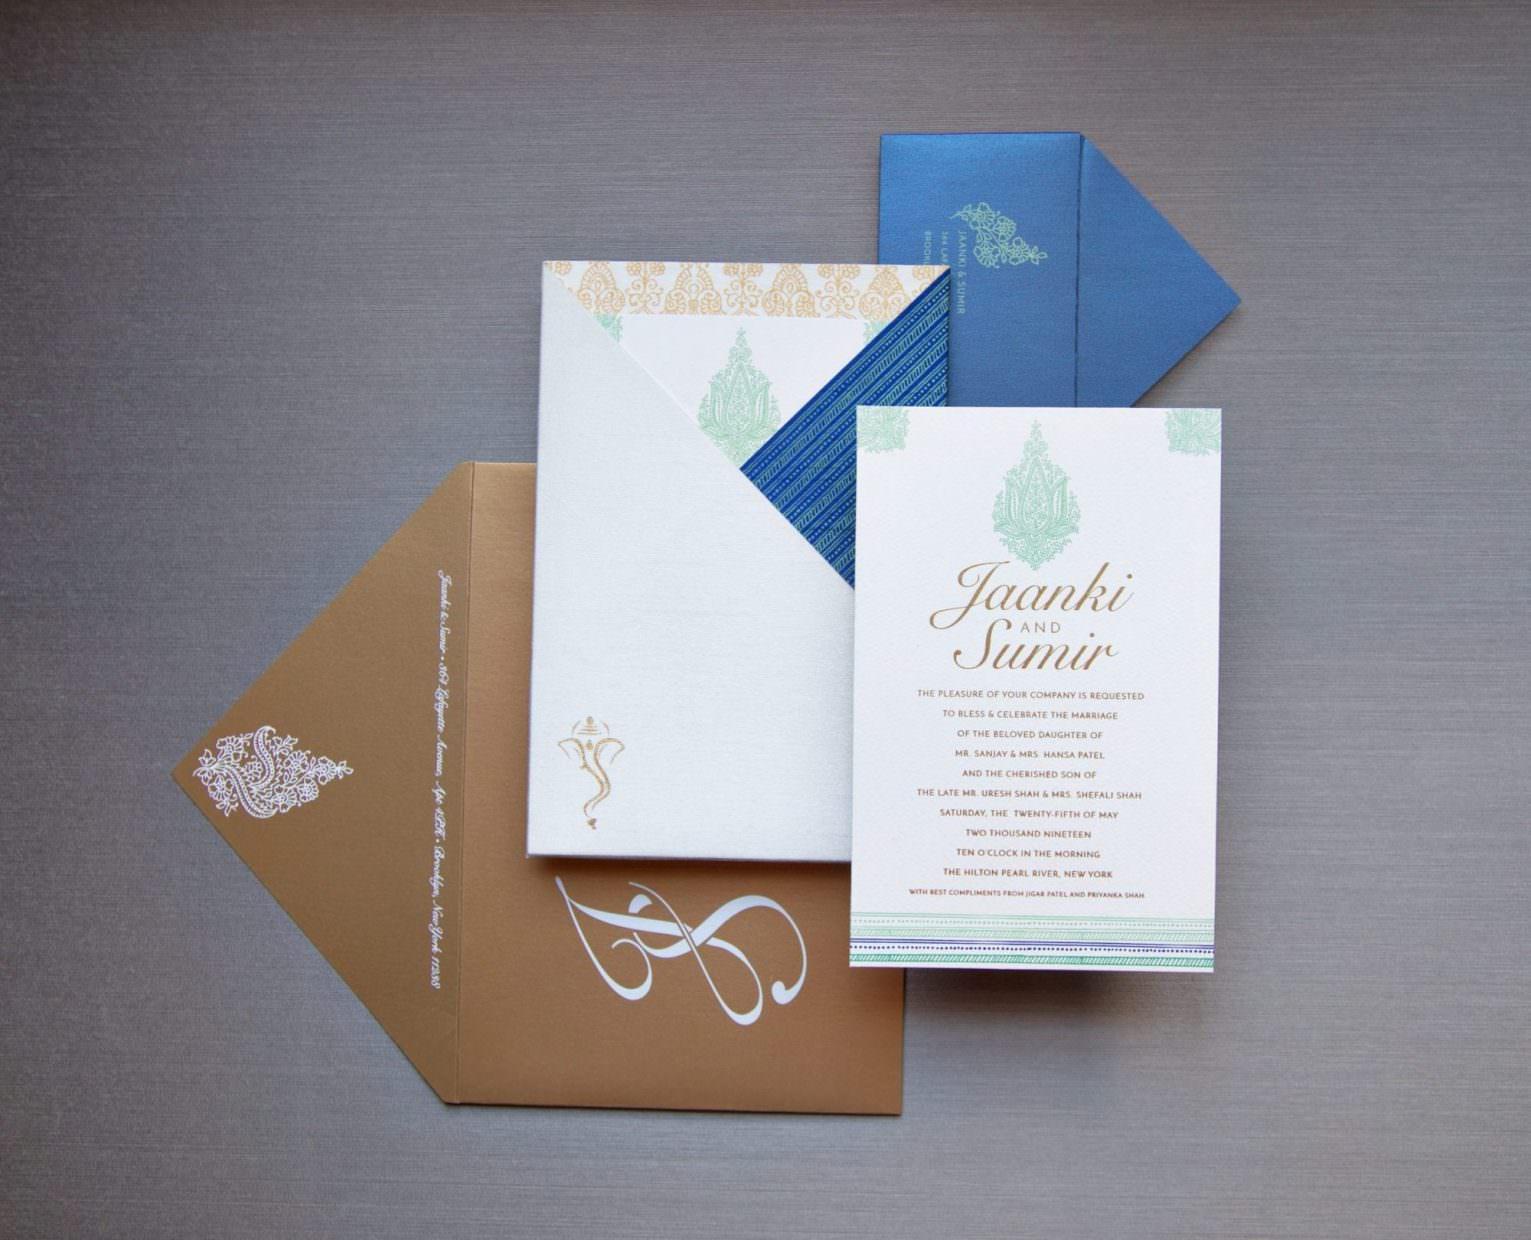 Raw Silk Pocket with custom printed invitation for Indian Wedding